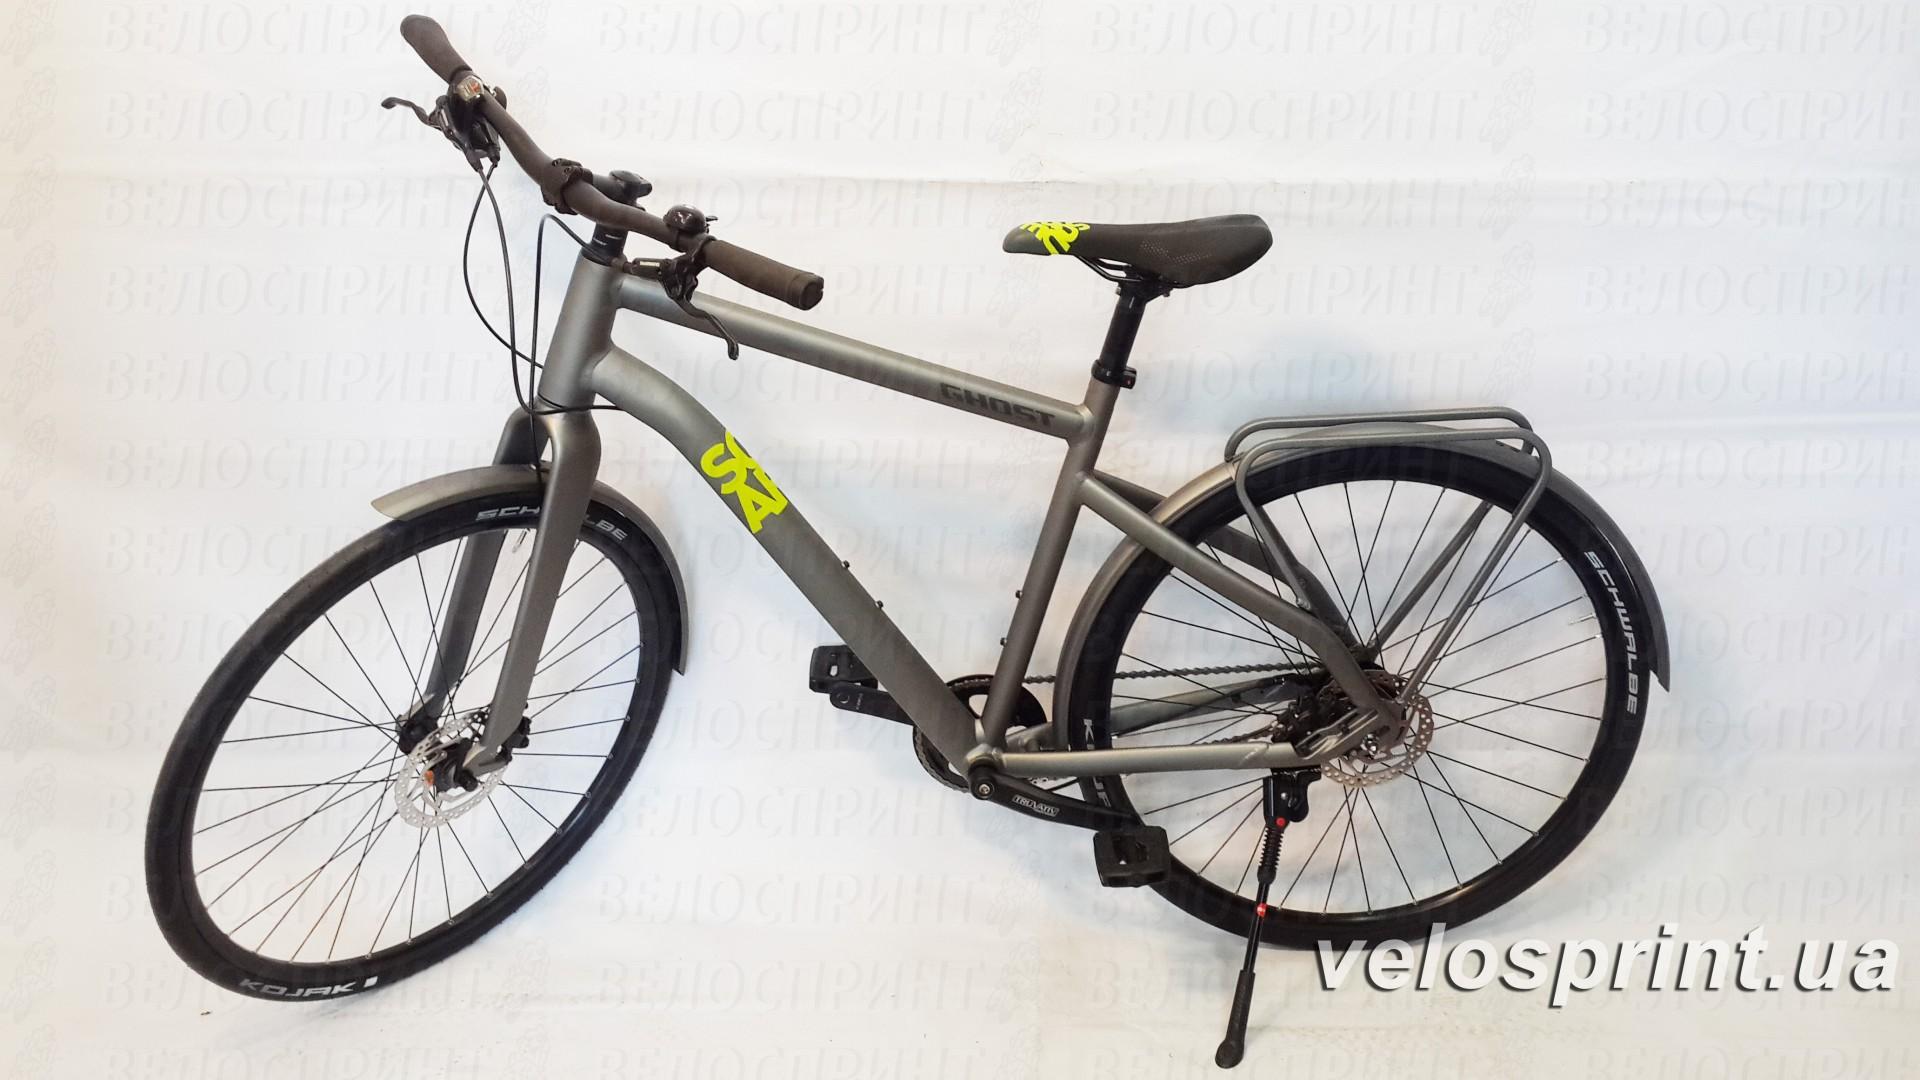 Велосипед GHOST Square Urban 4 grey/limegreen общий вид год 2016